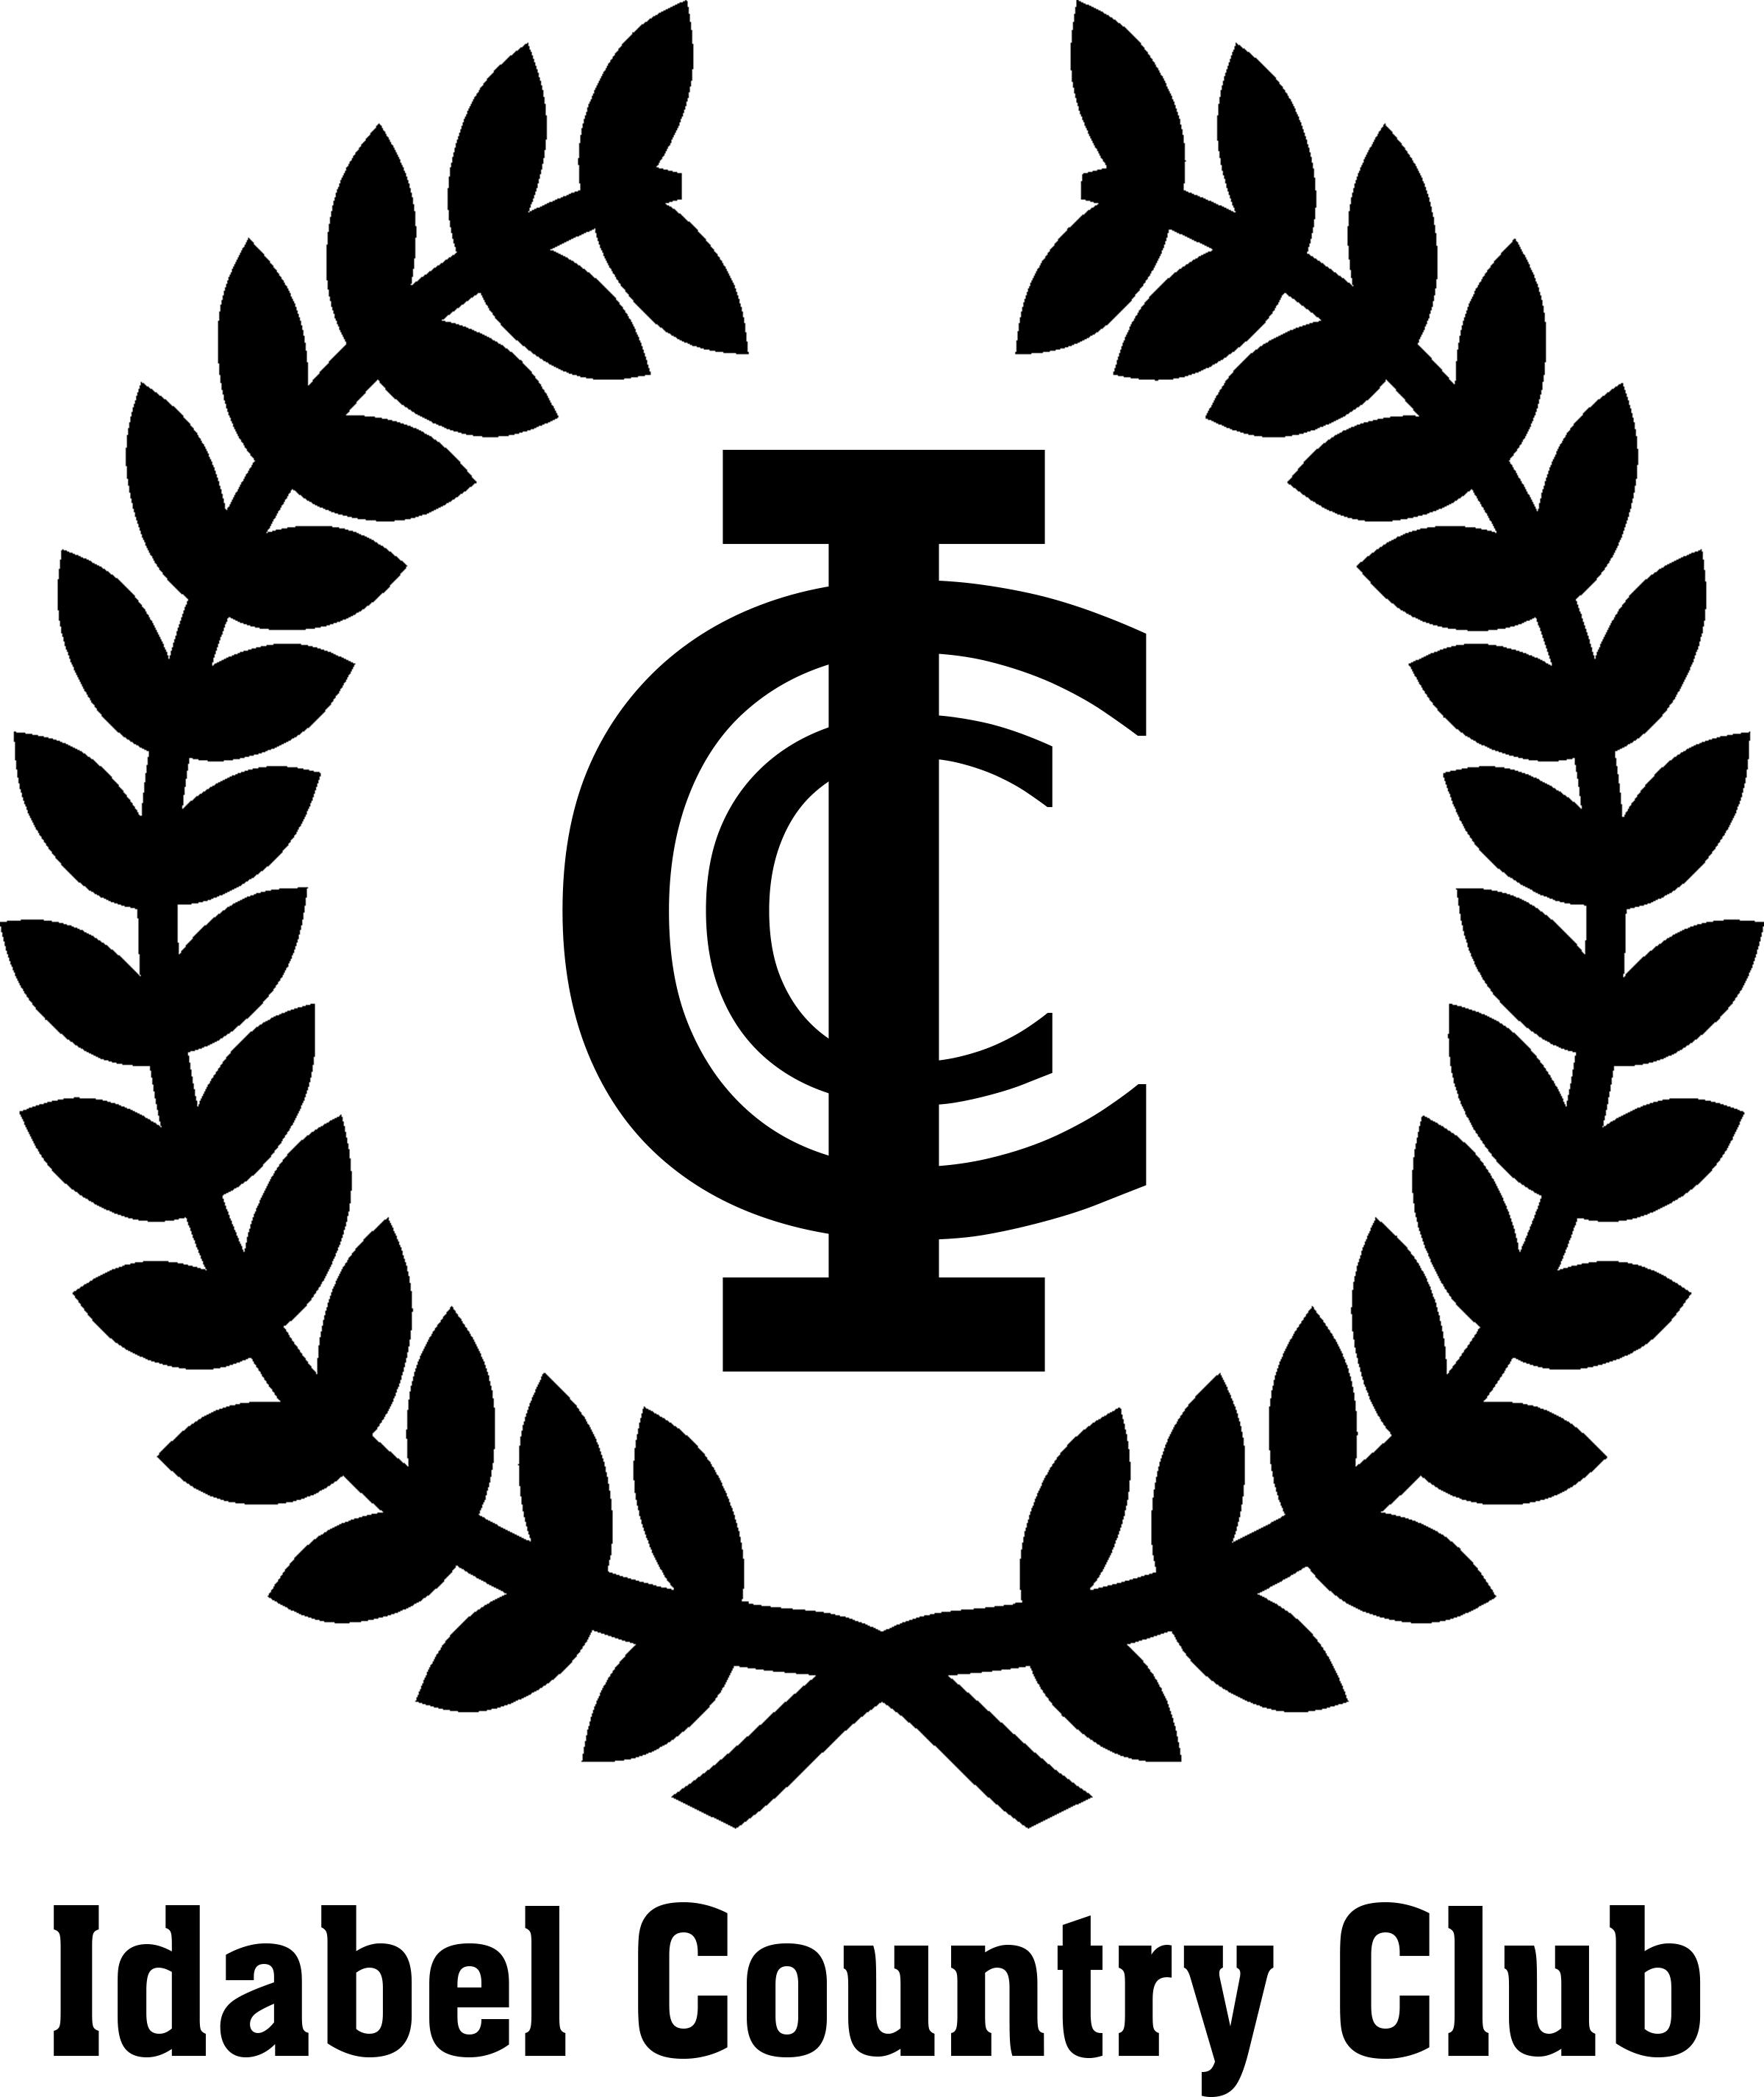 Idabel Country Club